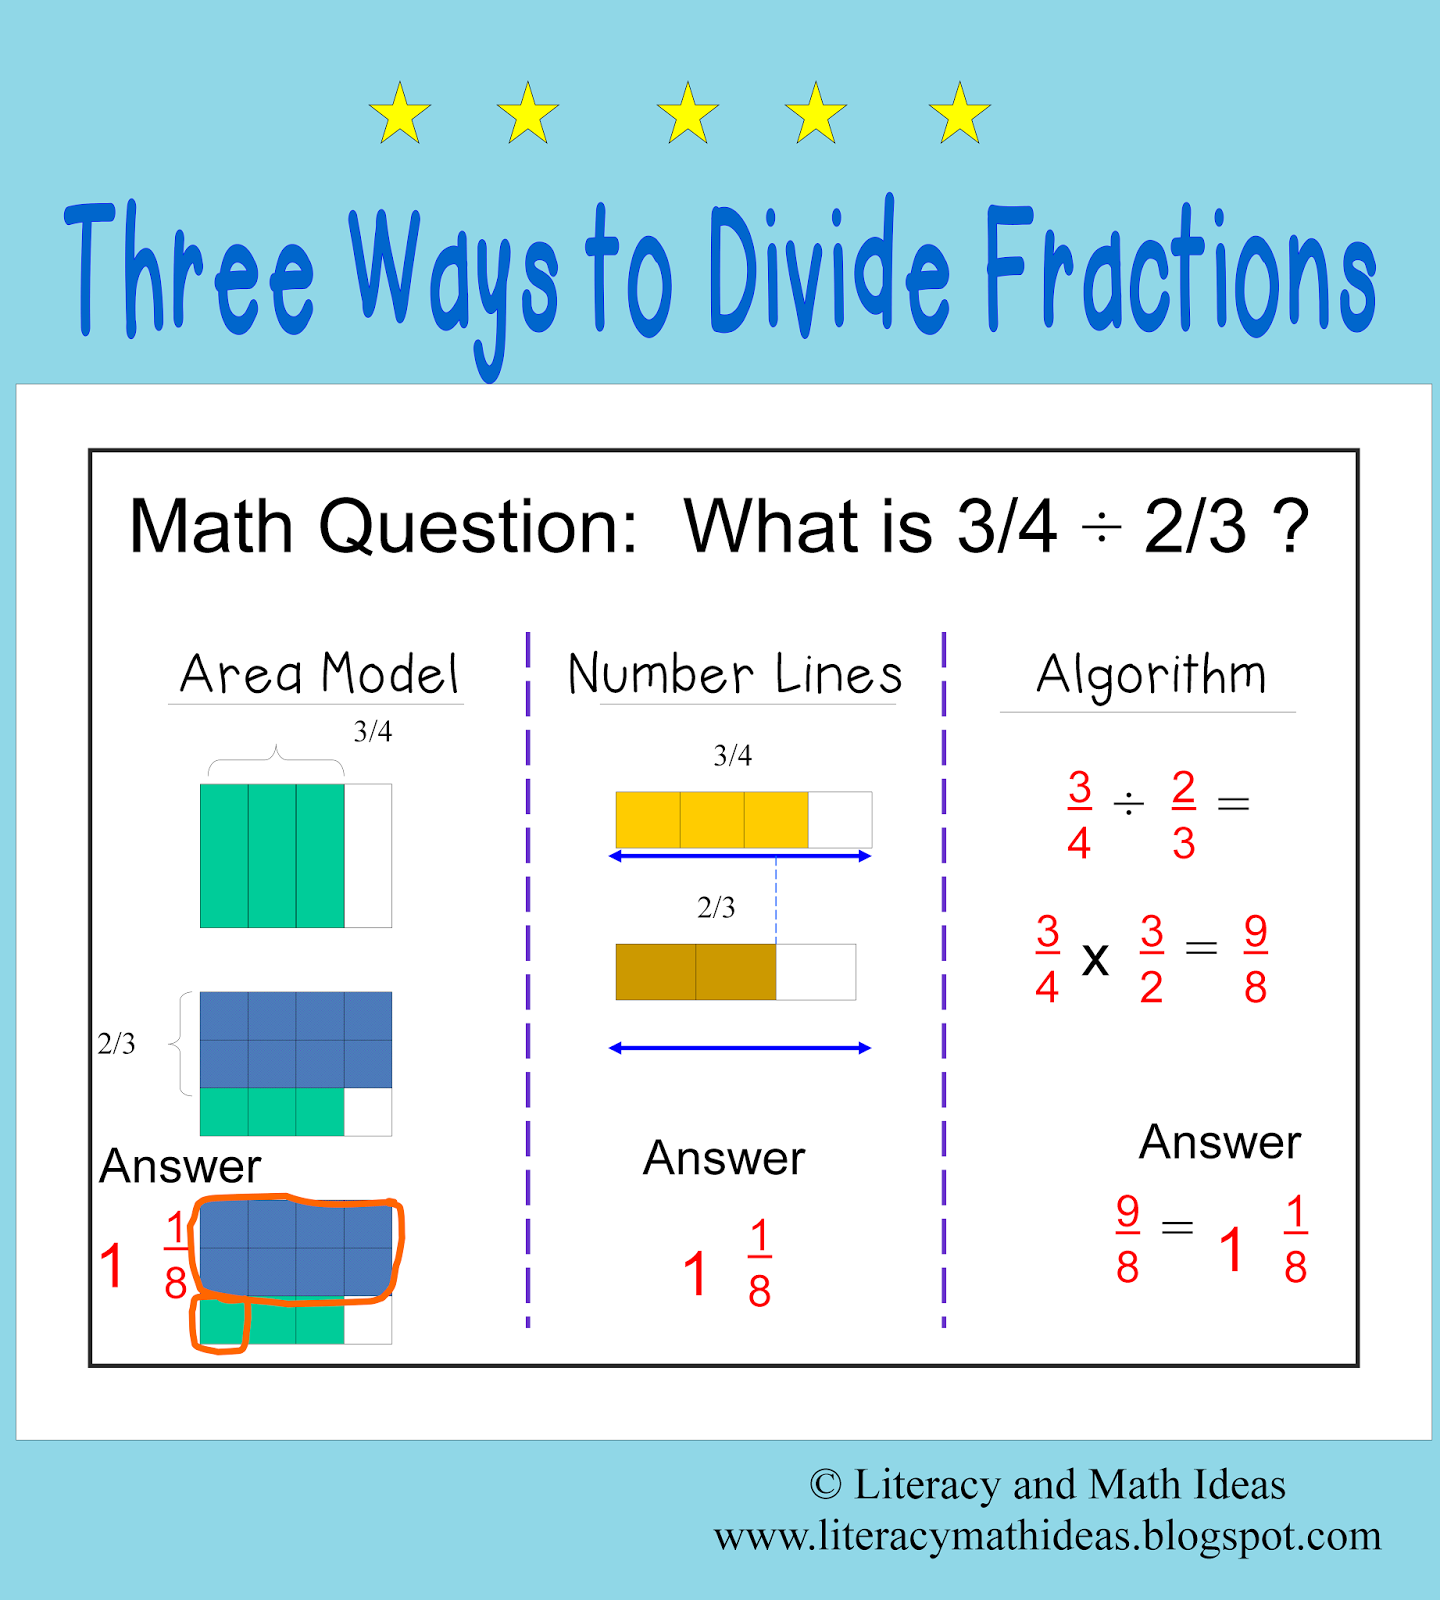 Literacy \u0026 Math Ideas: Three Ways to Divide Fractions   Math fractions [ 1600 x 1440 Pixel ]